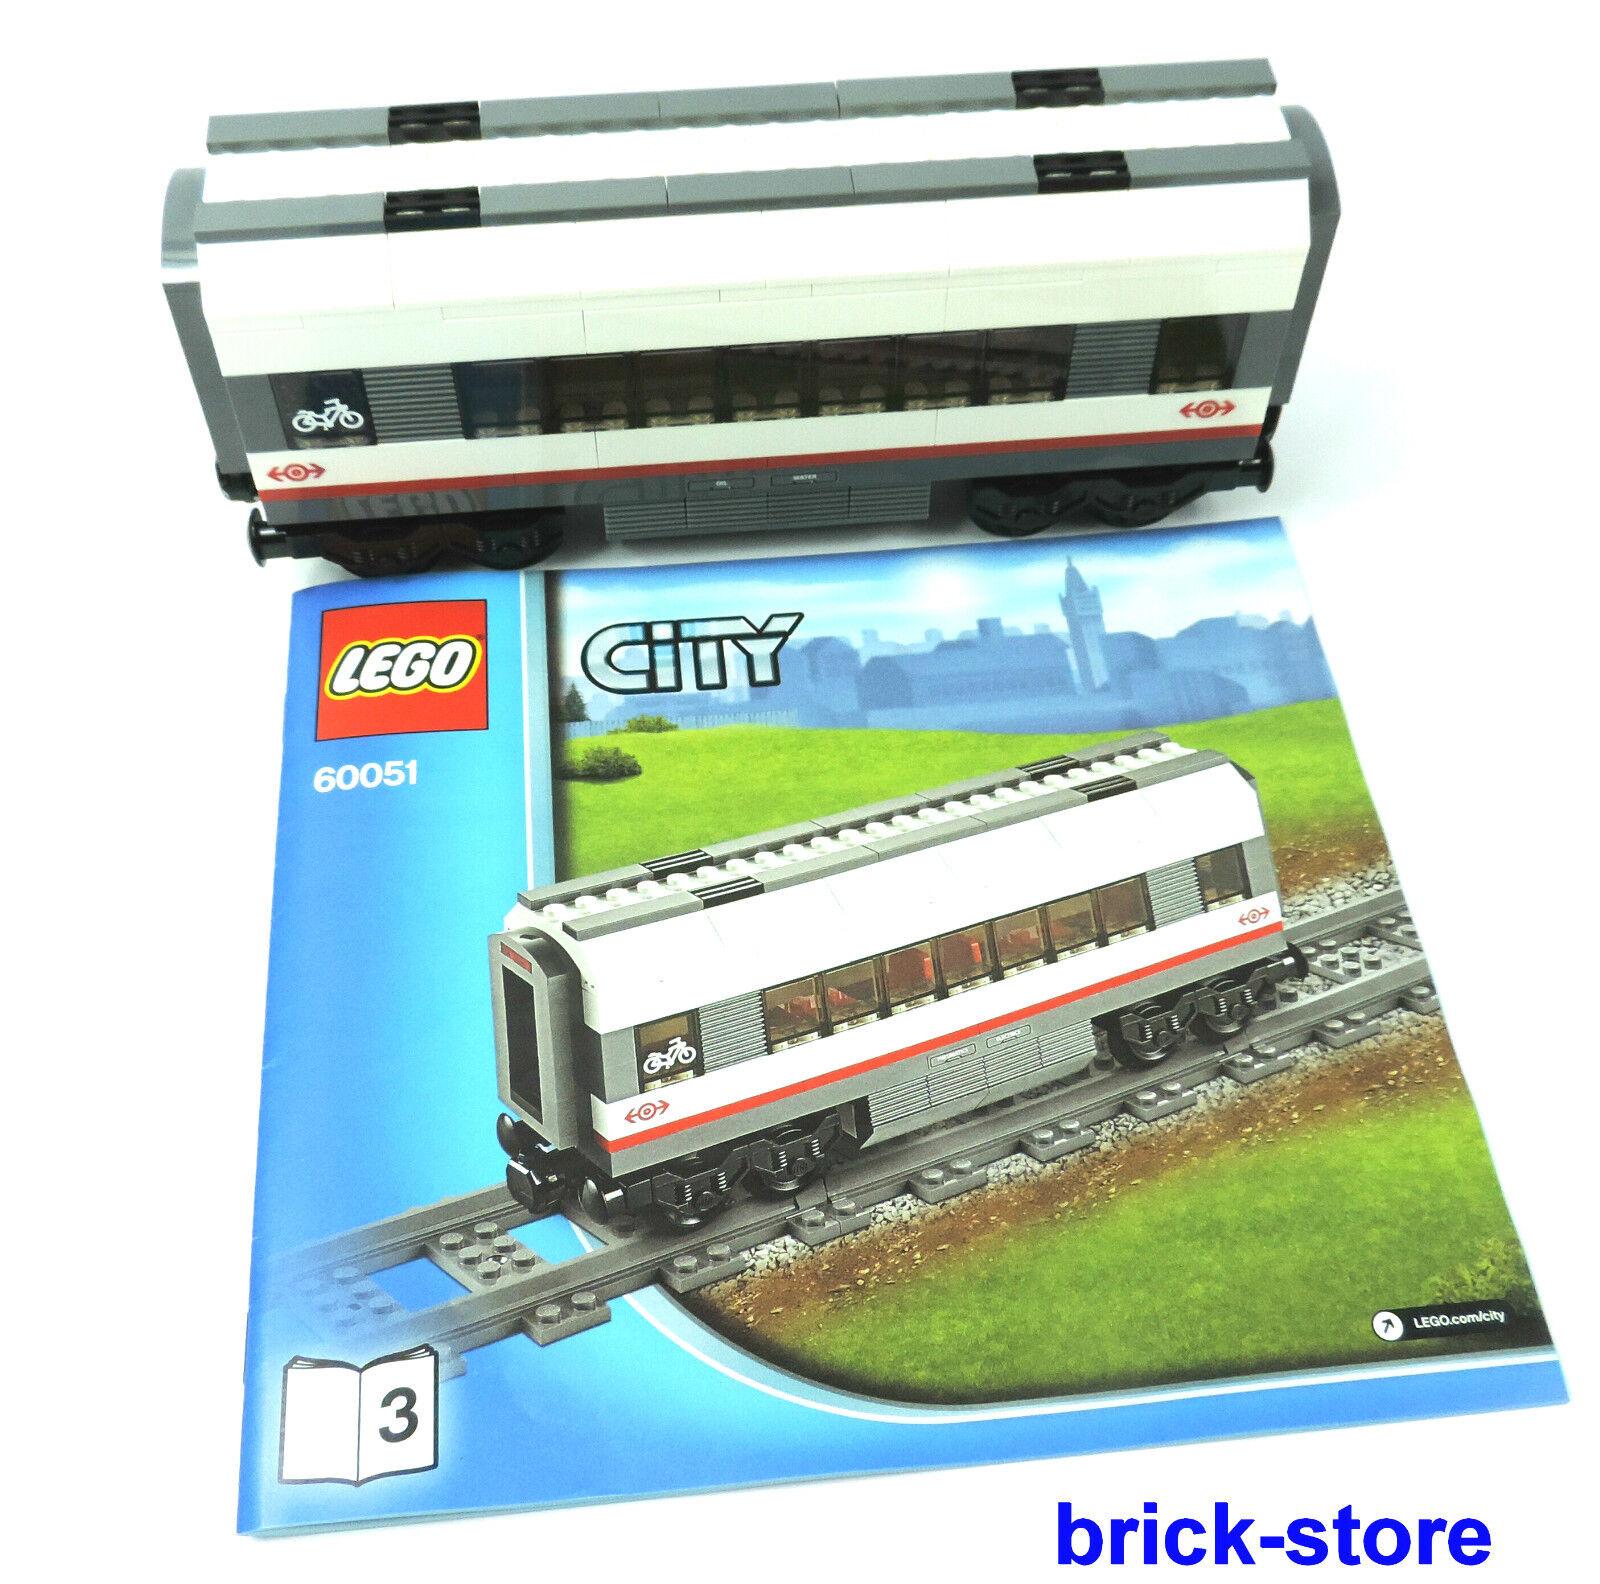 LEGO ® City chemins de fer (60051) wagon moyens wagon vélo wagon